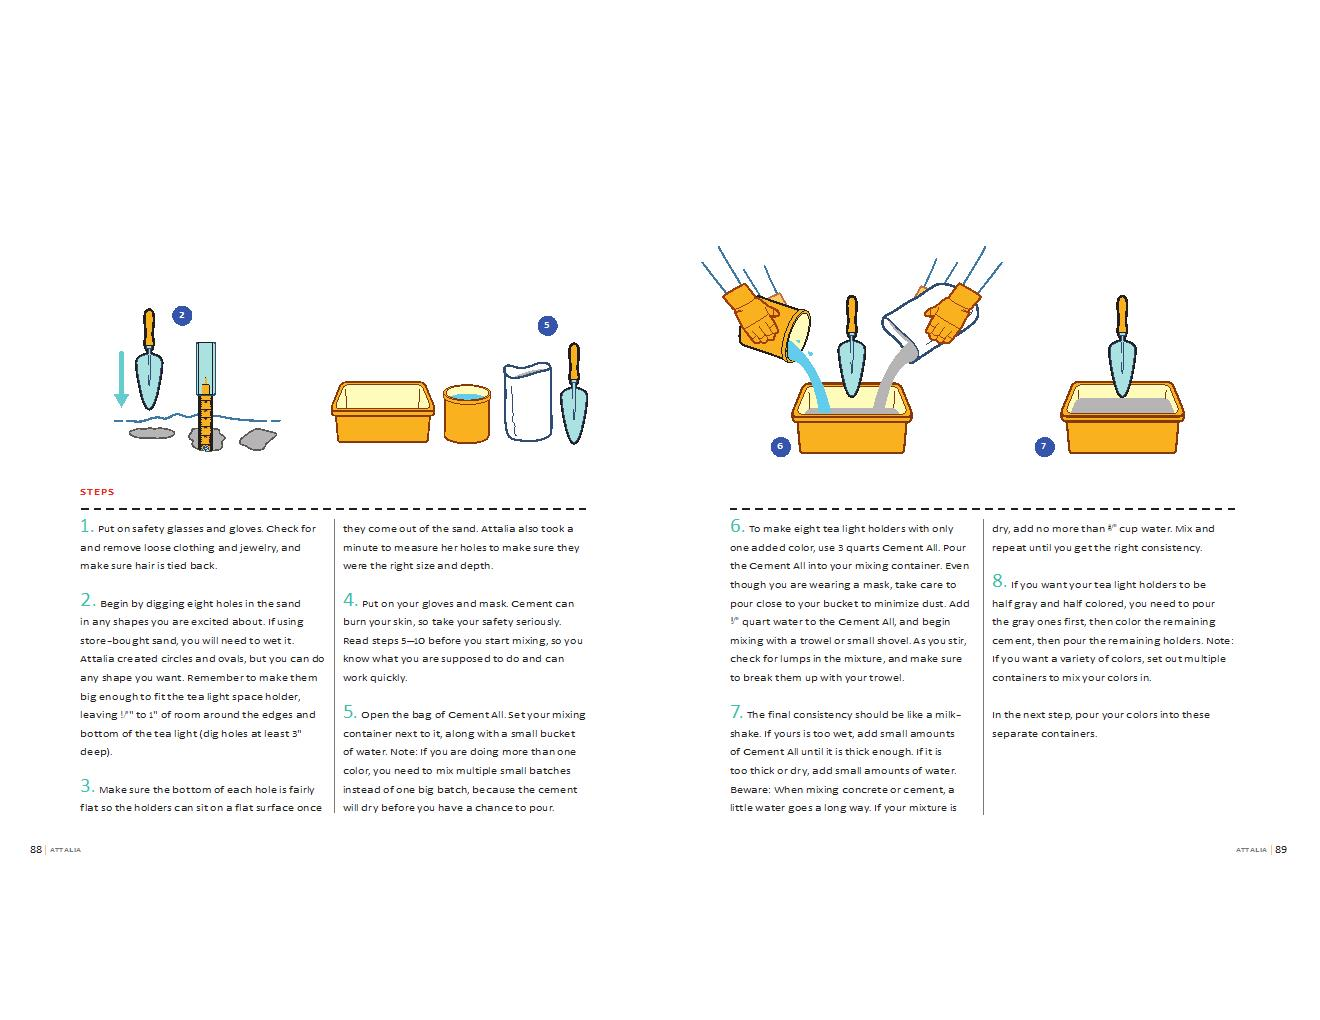 GB instructions 2